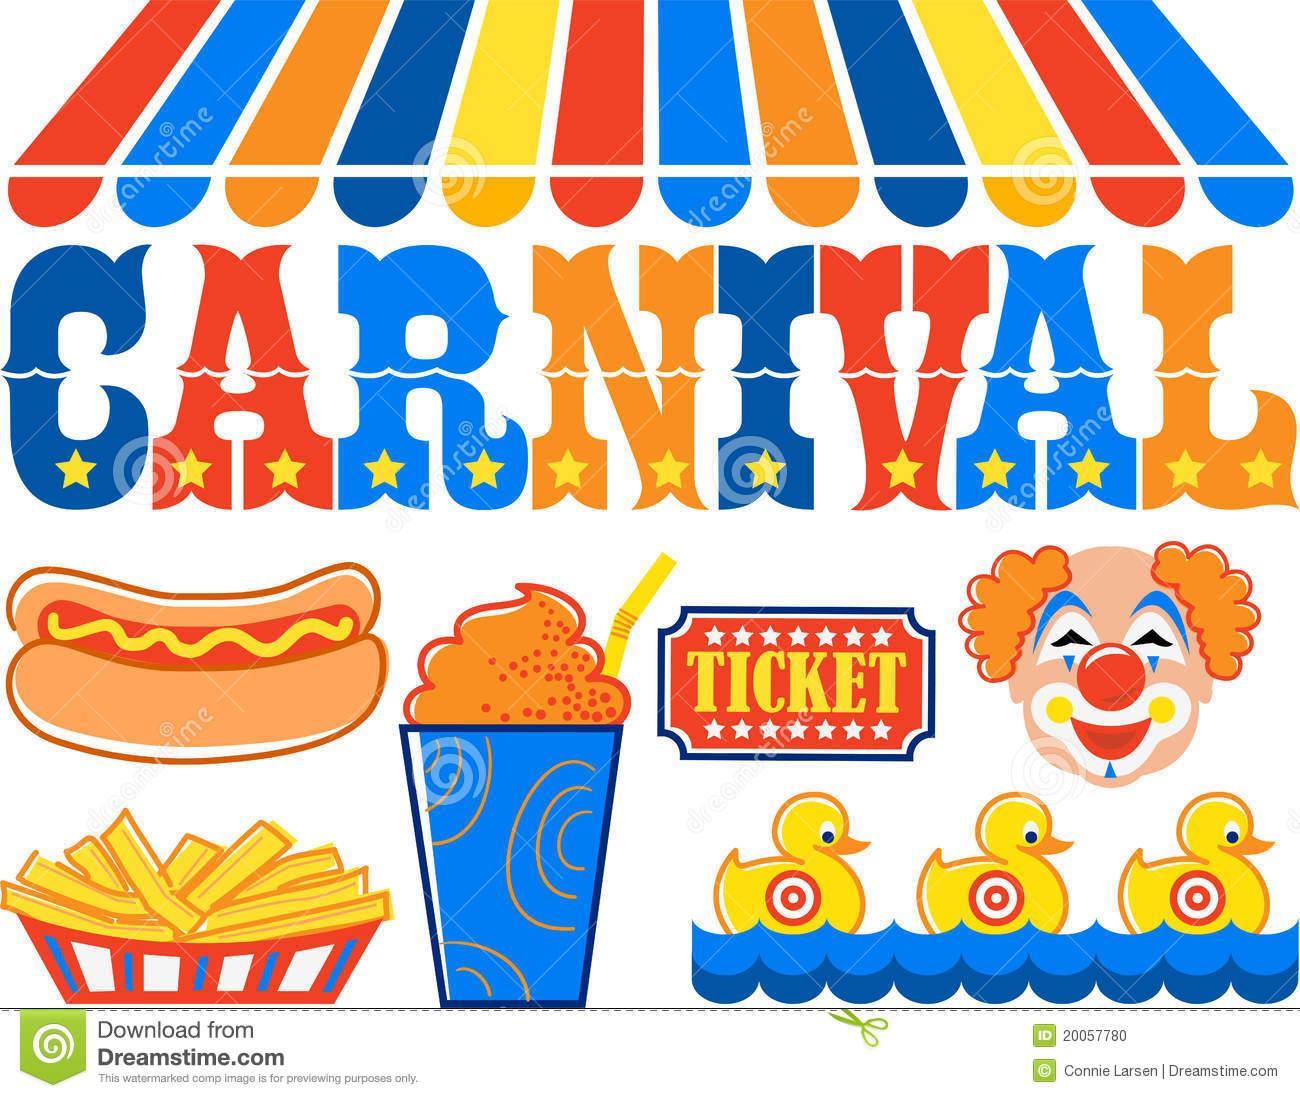 Headline Illustration Of The Word Carniv-Headline Illustration Of The Word Carnival With Hot Dog Fries Slushy-4